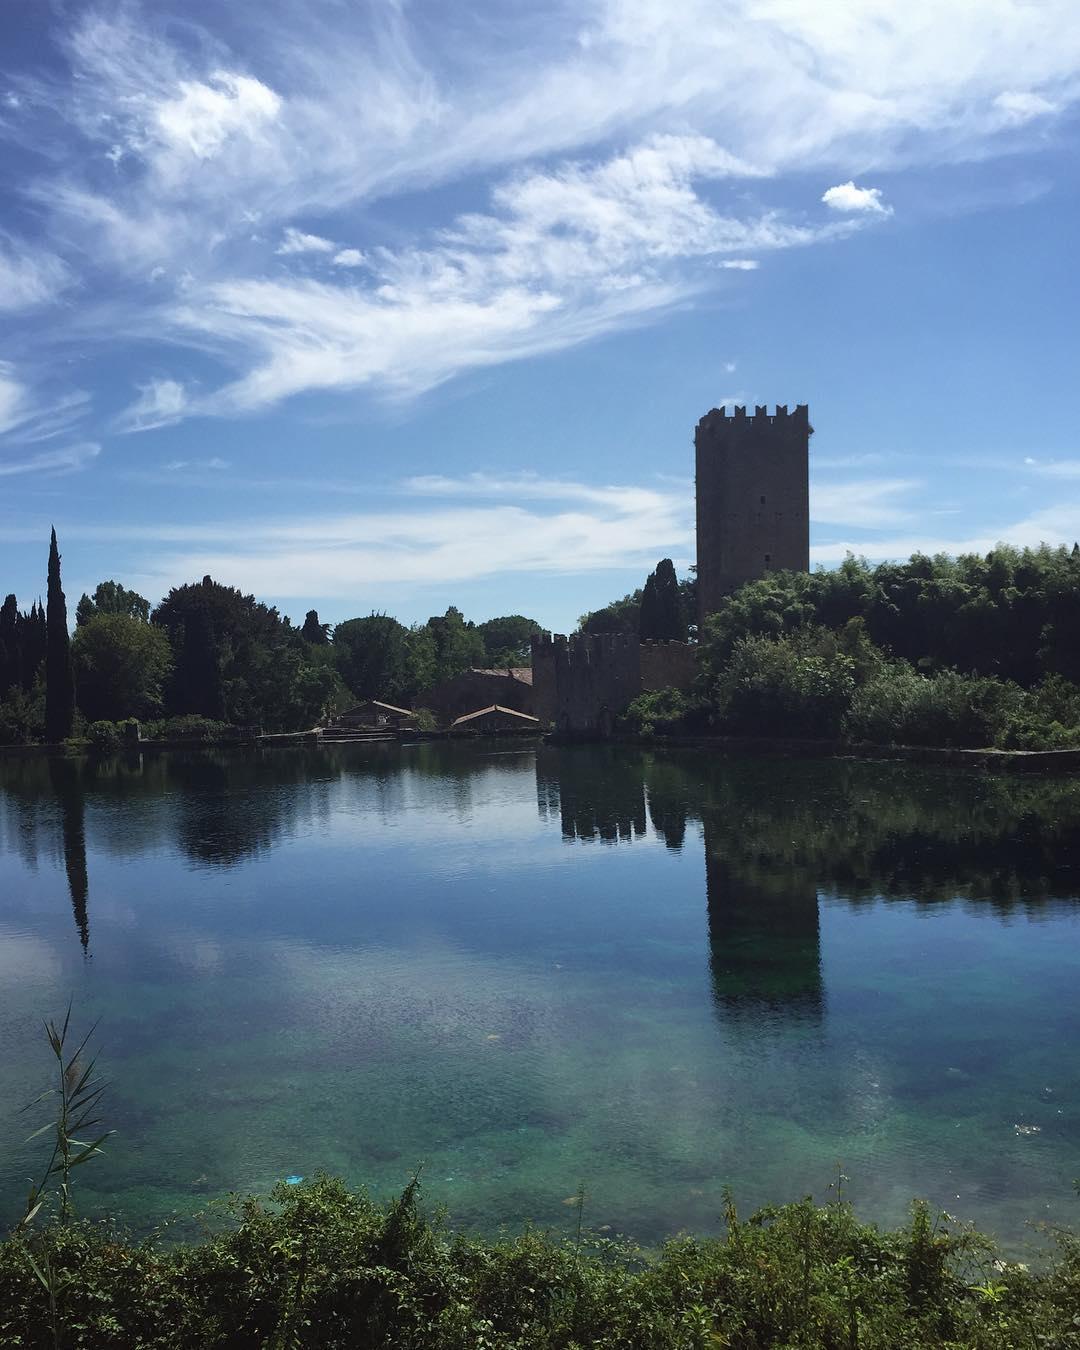 lago giardino ninfa